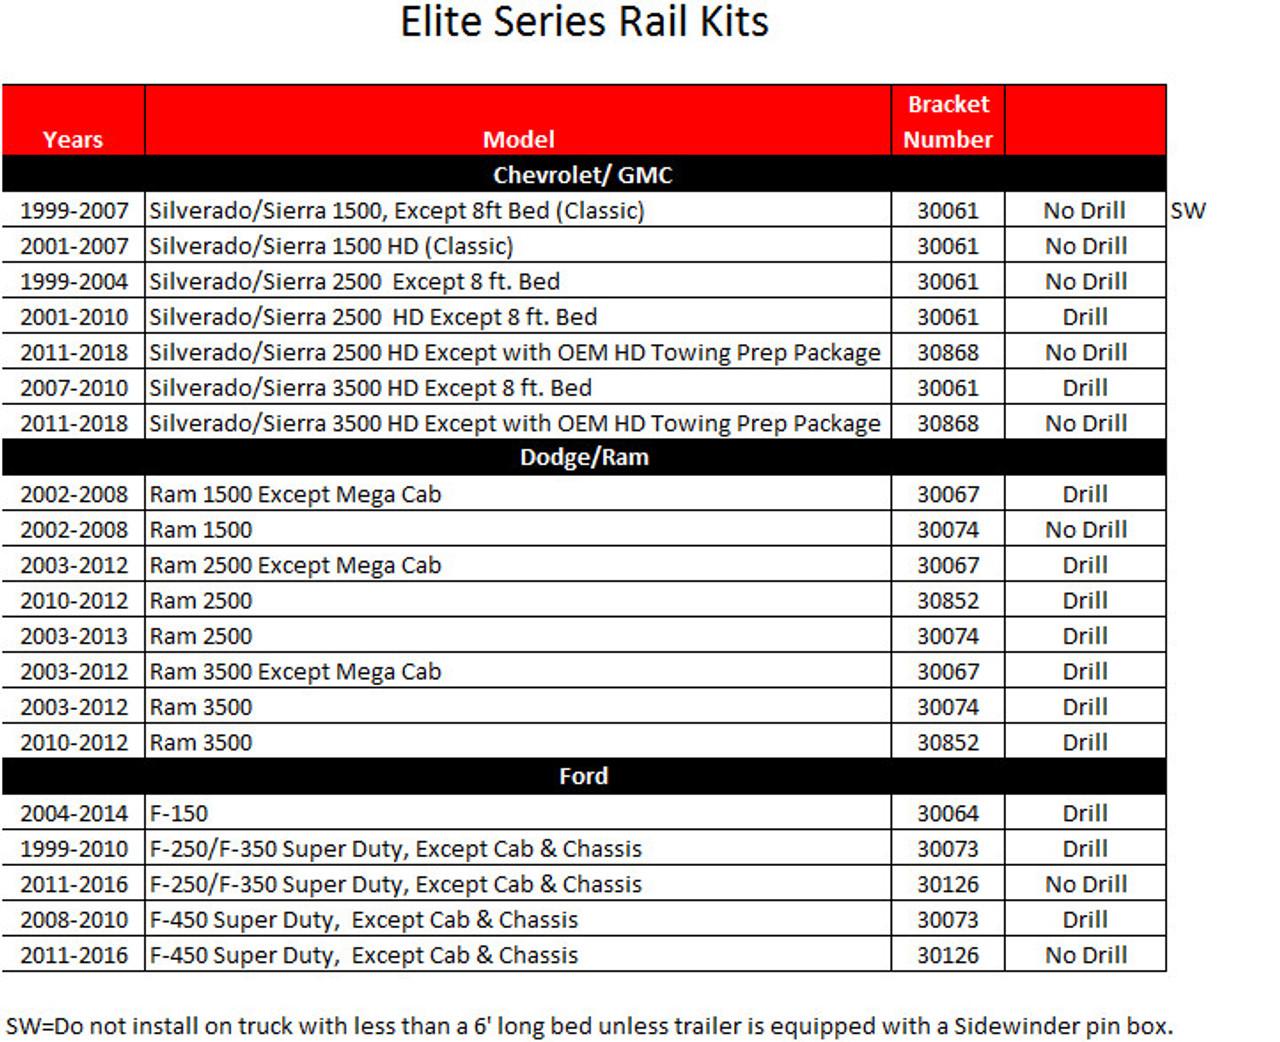 Elite Rail Kits --- Find the right Elite Rail Kit to fit your Pickup